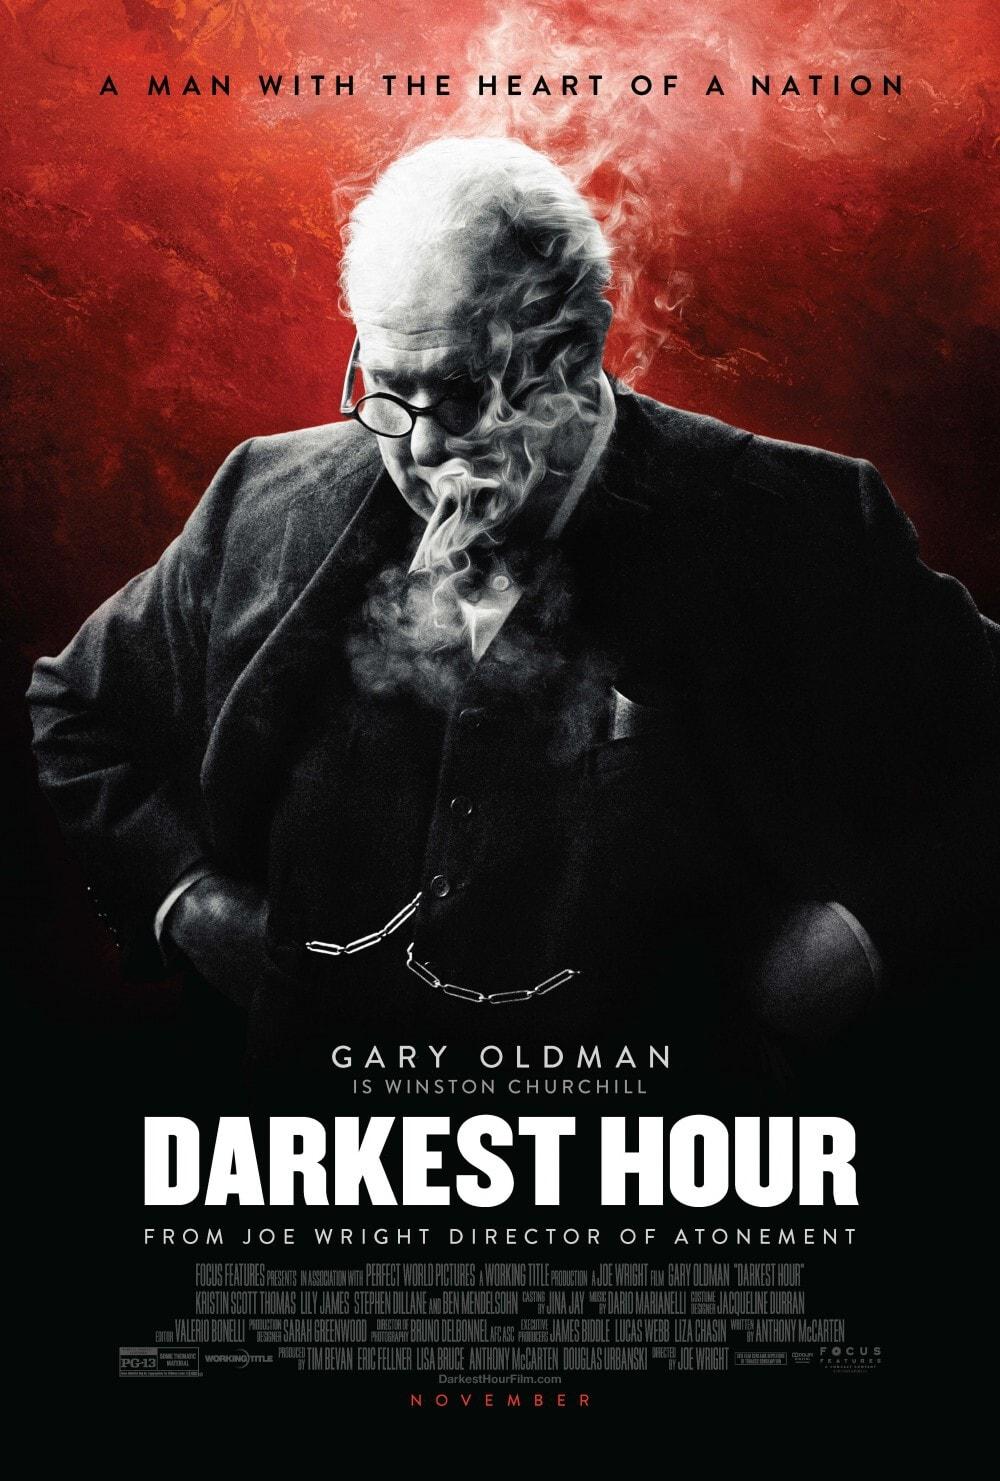 The Darkest Hour - New Poster